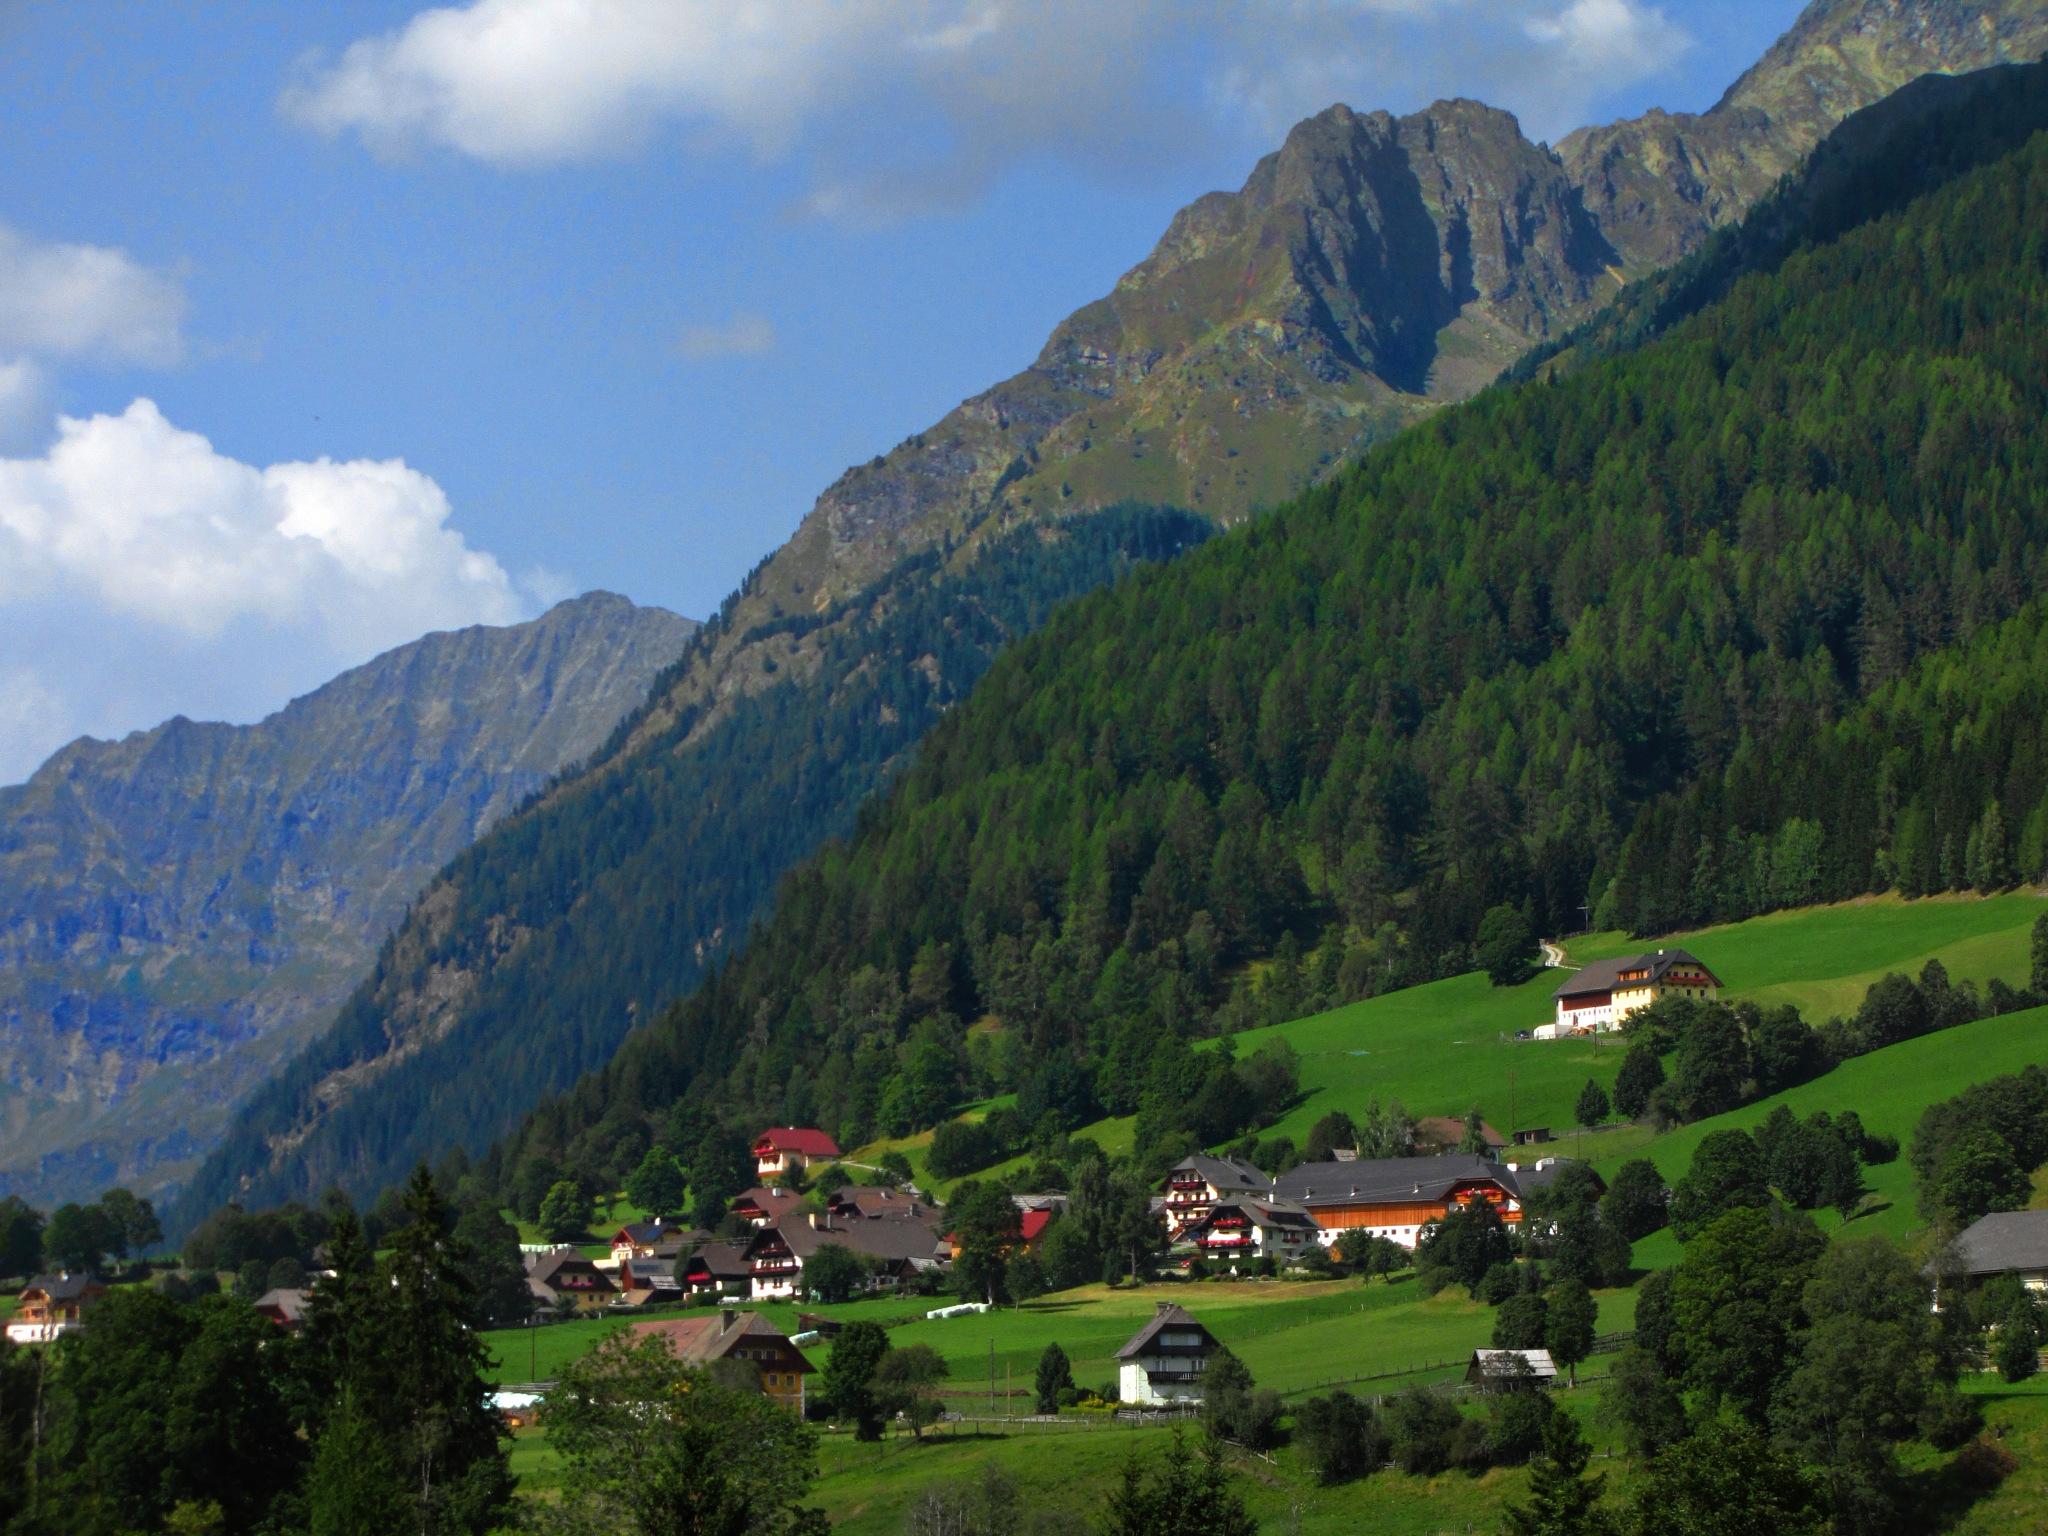 My great-grandfather's birthplace (Göriach - Salzburger Lungau - Austria) by Z_e_n_o